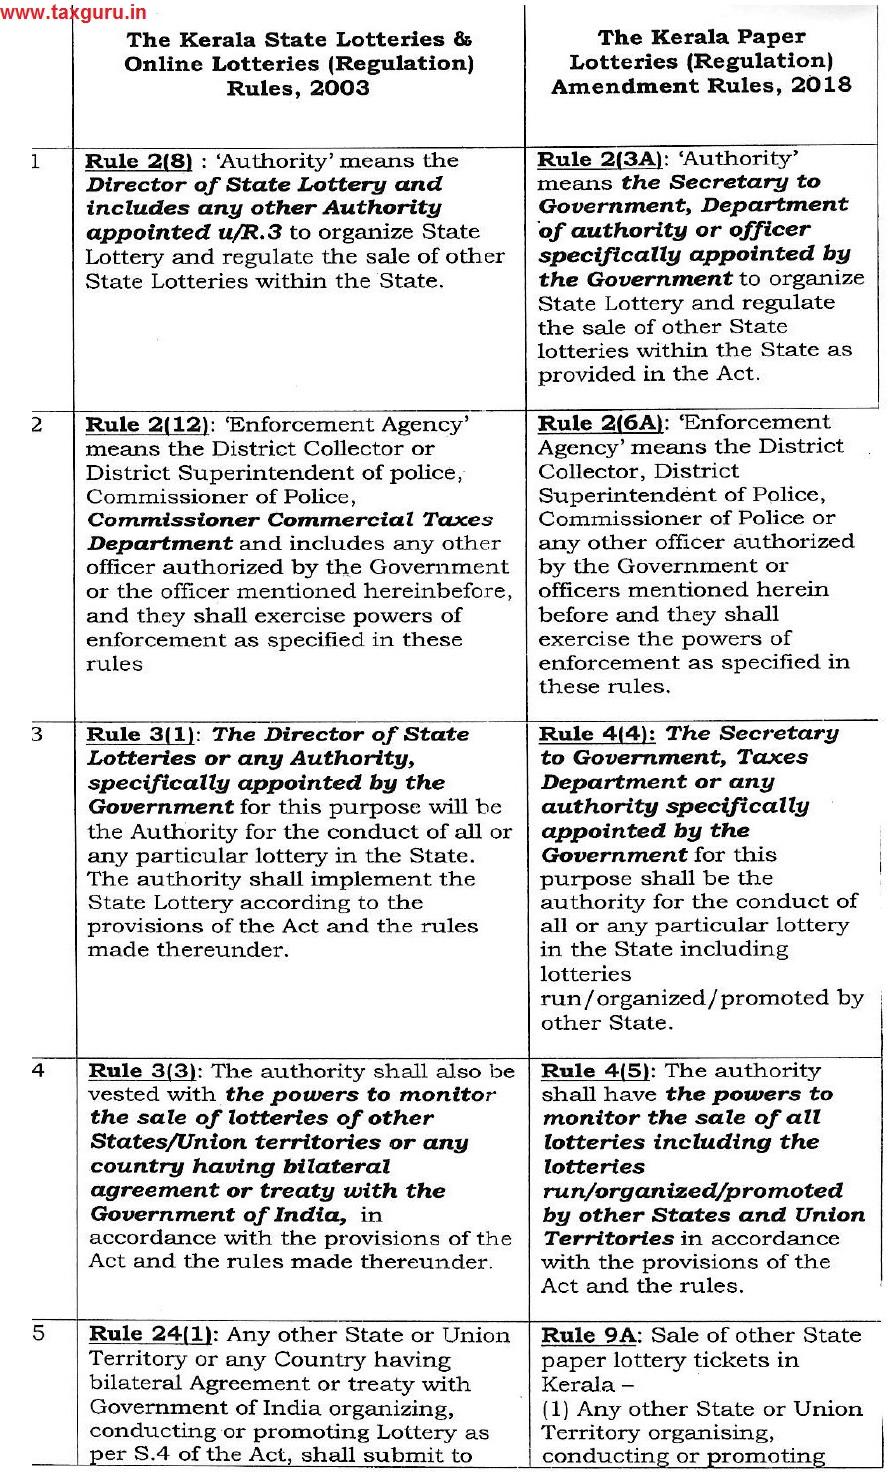 The Kerala Kerala State Lotteries & Online Lotteries (Regulation) Rules, 2003 Vs The Kerala Paper Lotteries (Regulat Ion) Amendment Rules, 2018 Image 1